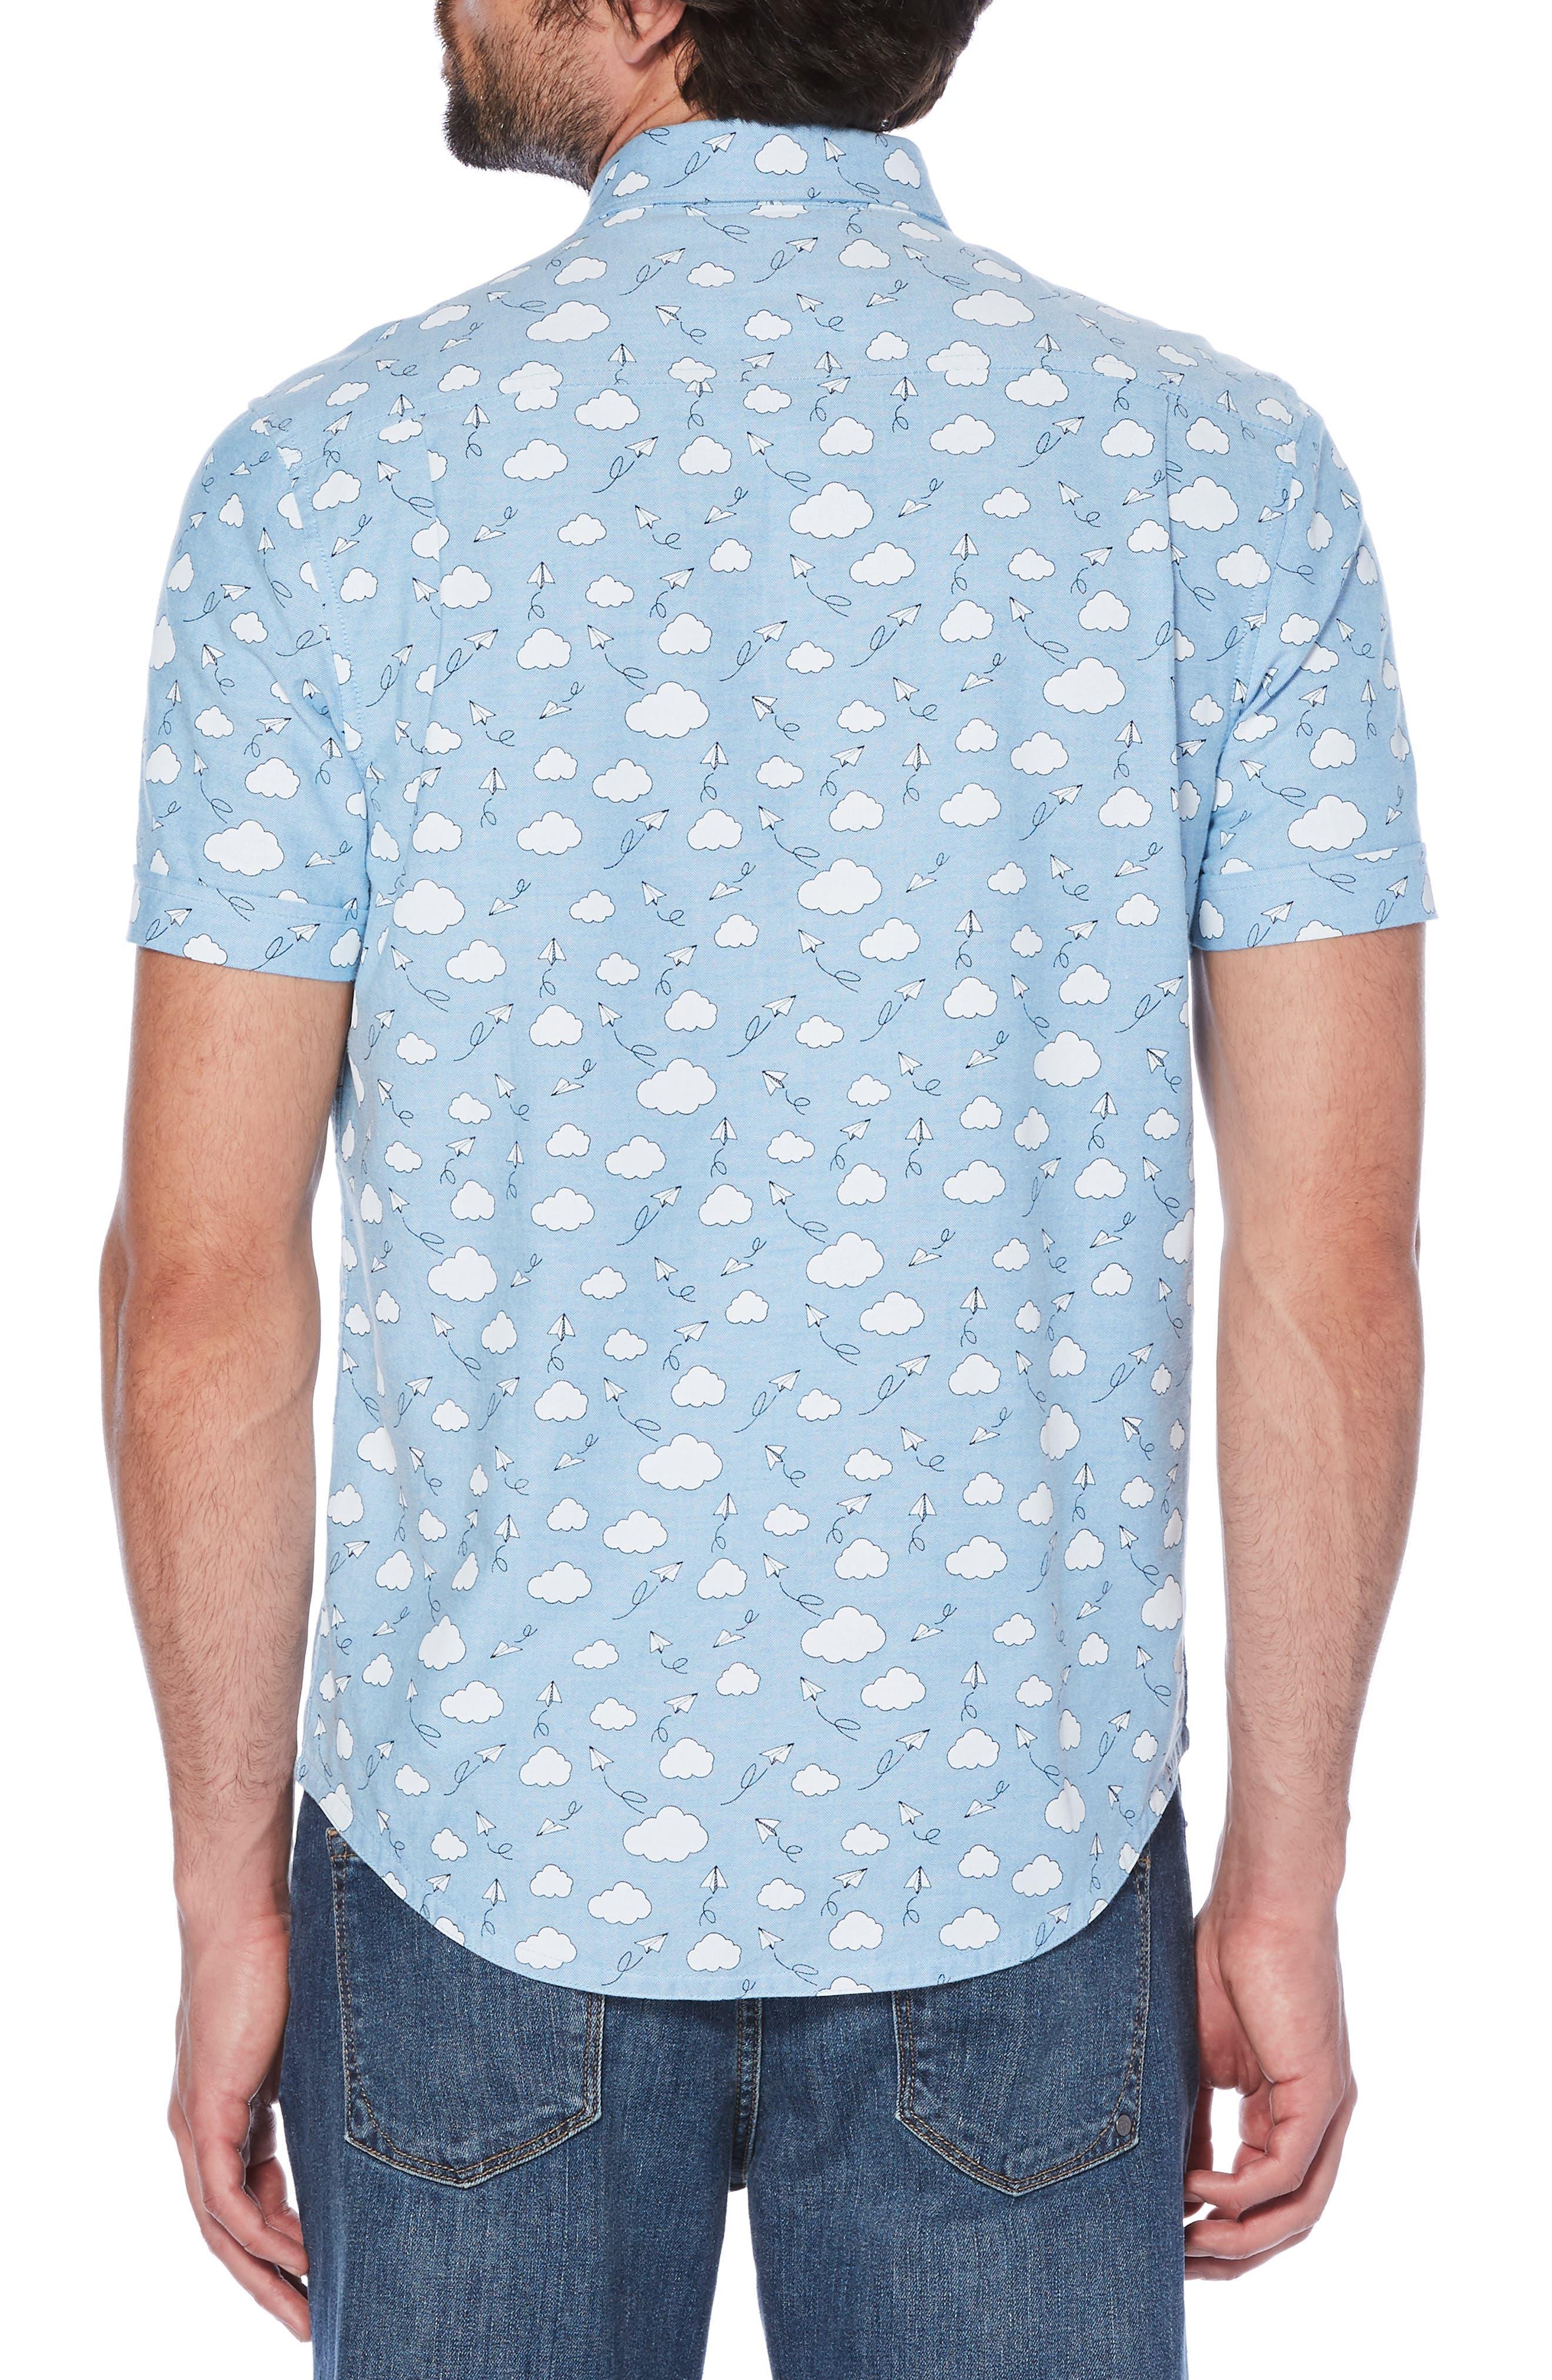 Cloud Print Oxford Shirt,                             Alternate thumbnail 2, color,                             DIVA BLUE